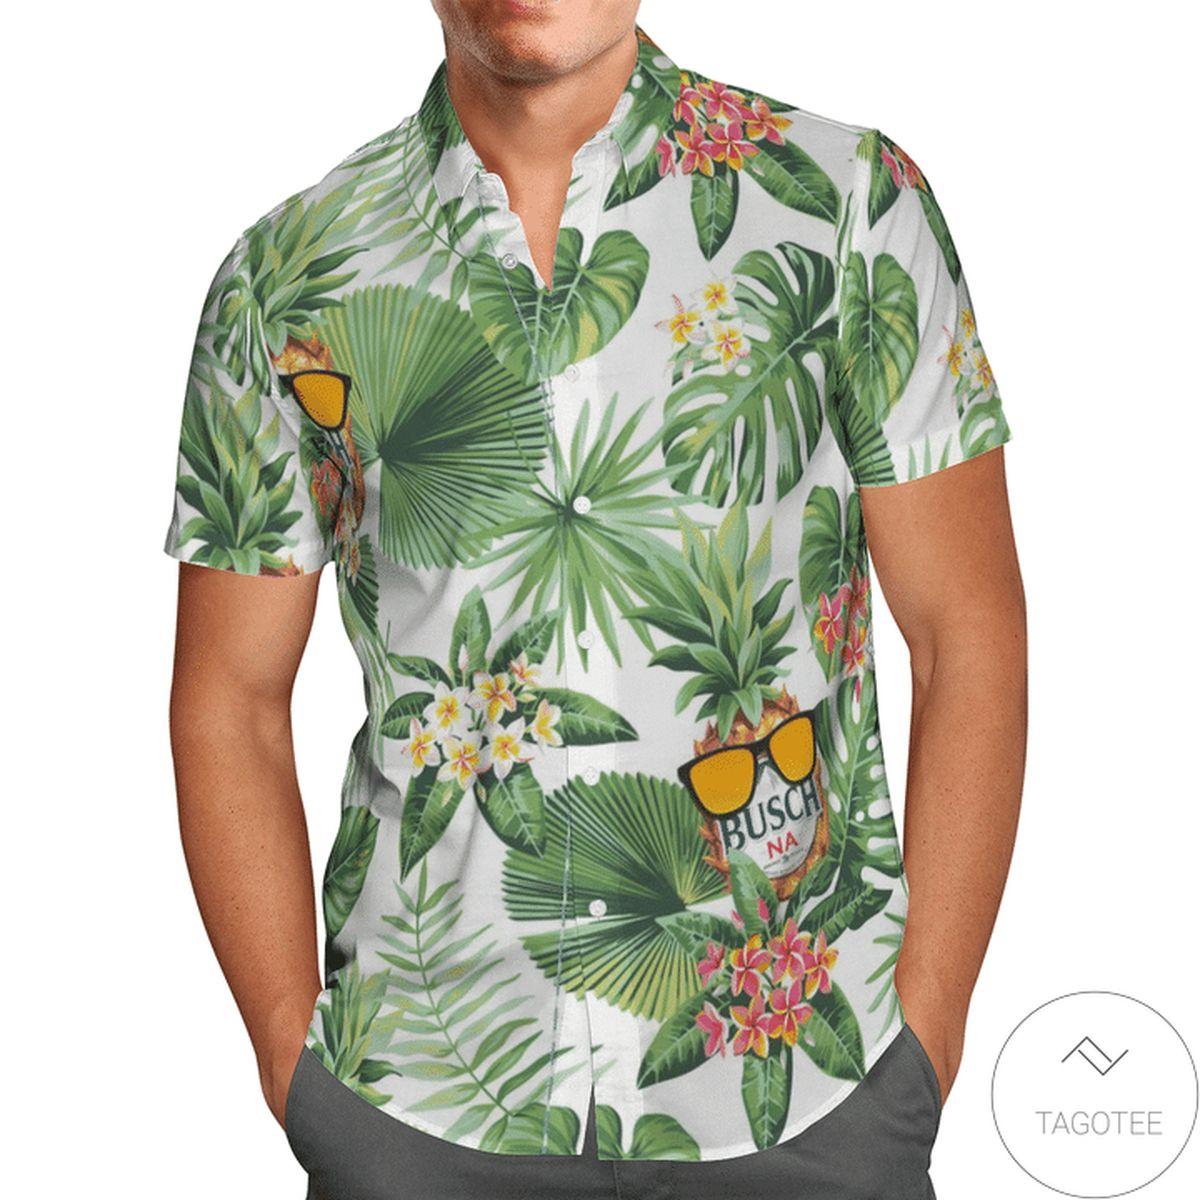 Busch Na Tropical Hawaiian Shirt